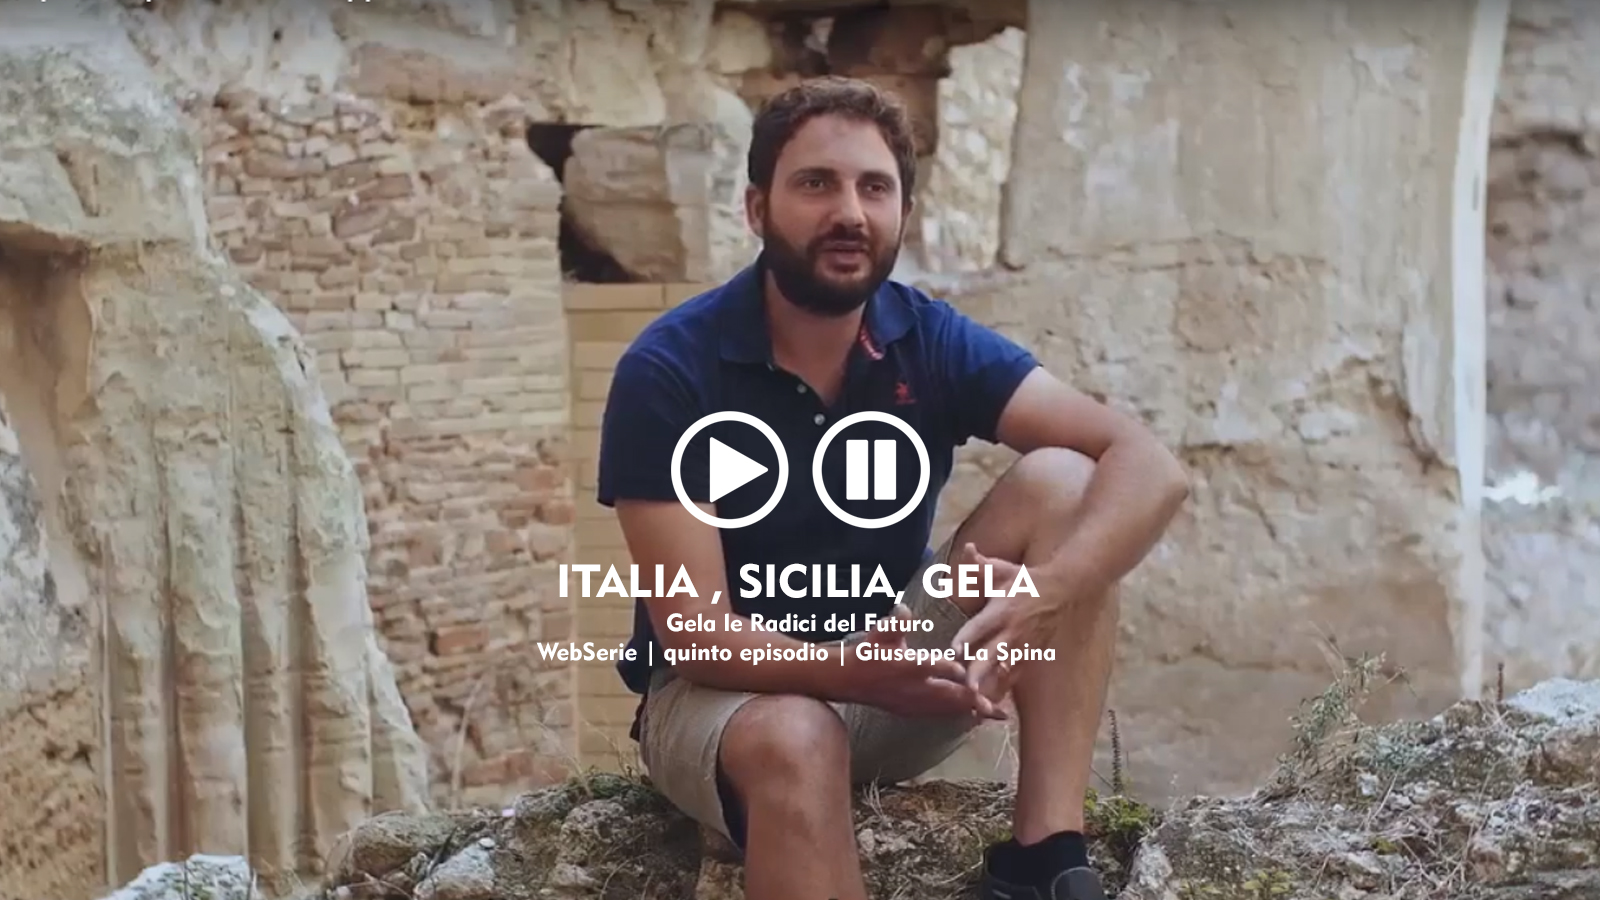 web serie | italia, sicilia, gela | quinto episodio | giuseppe